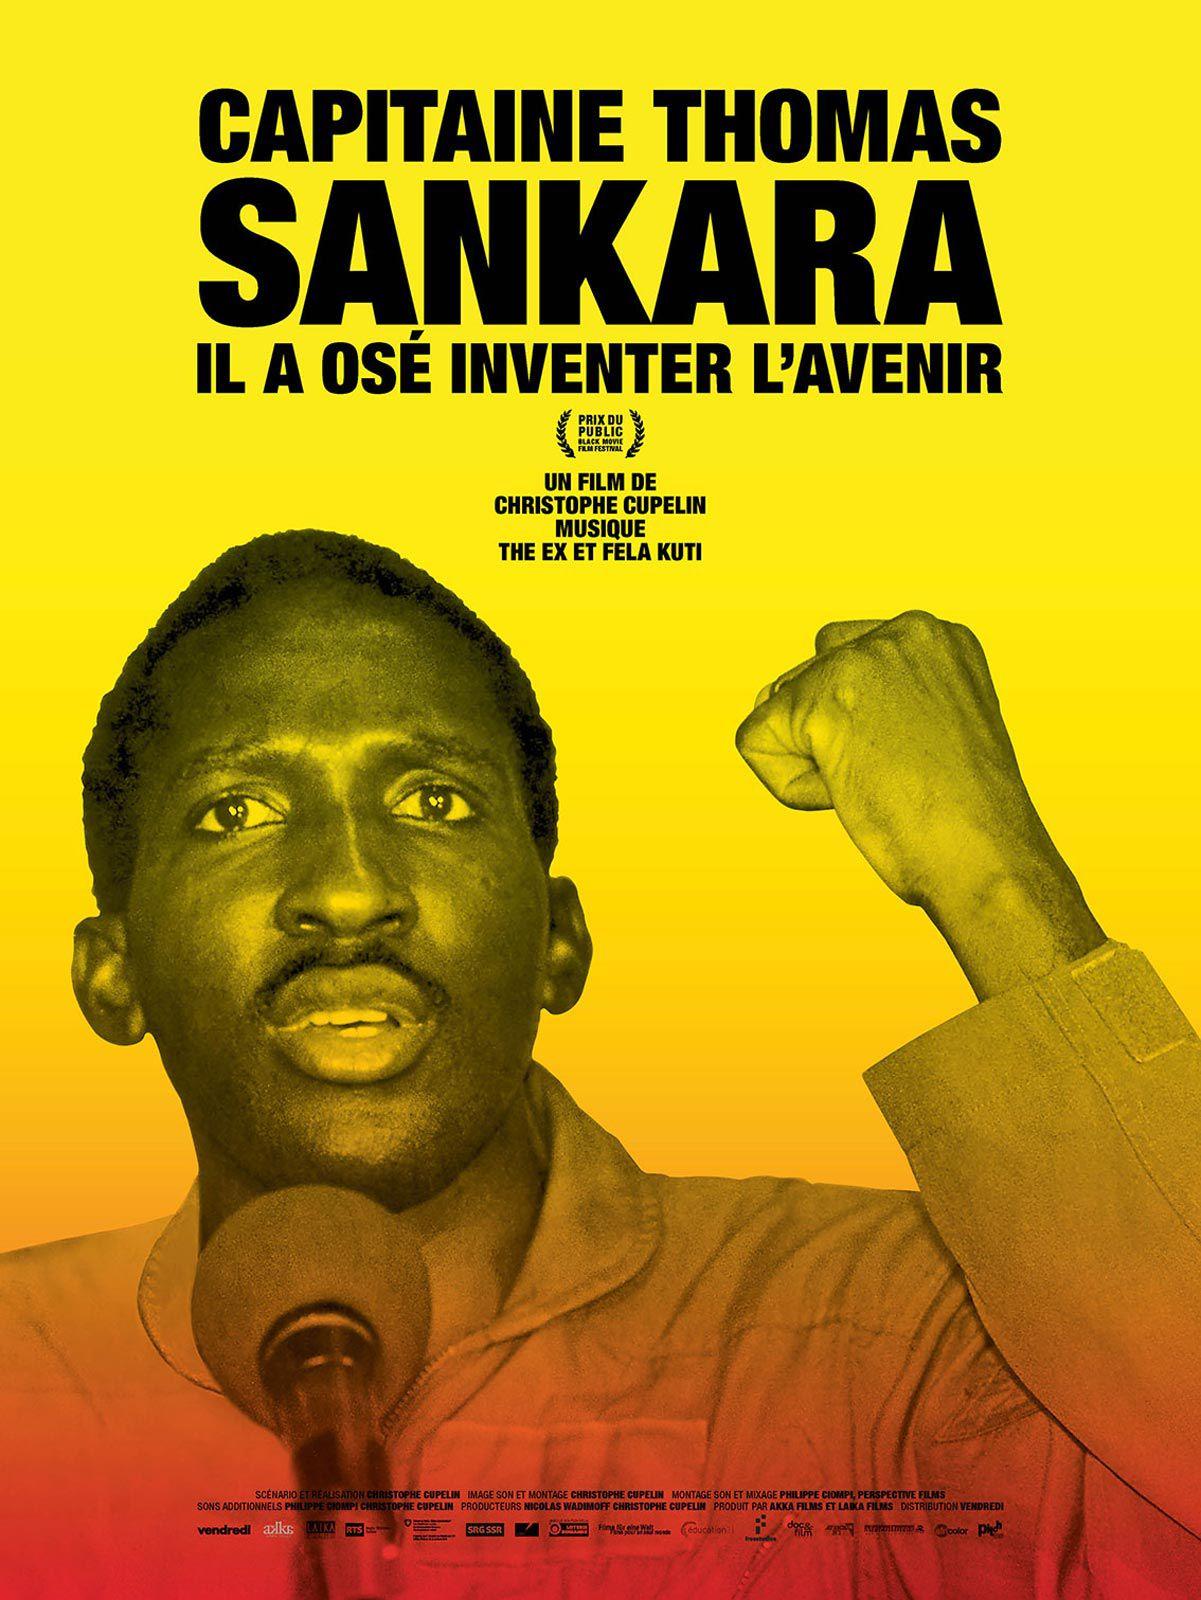 Capitaine Thomas Sankara - Documentaire (2015)